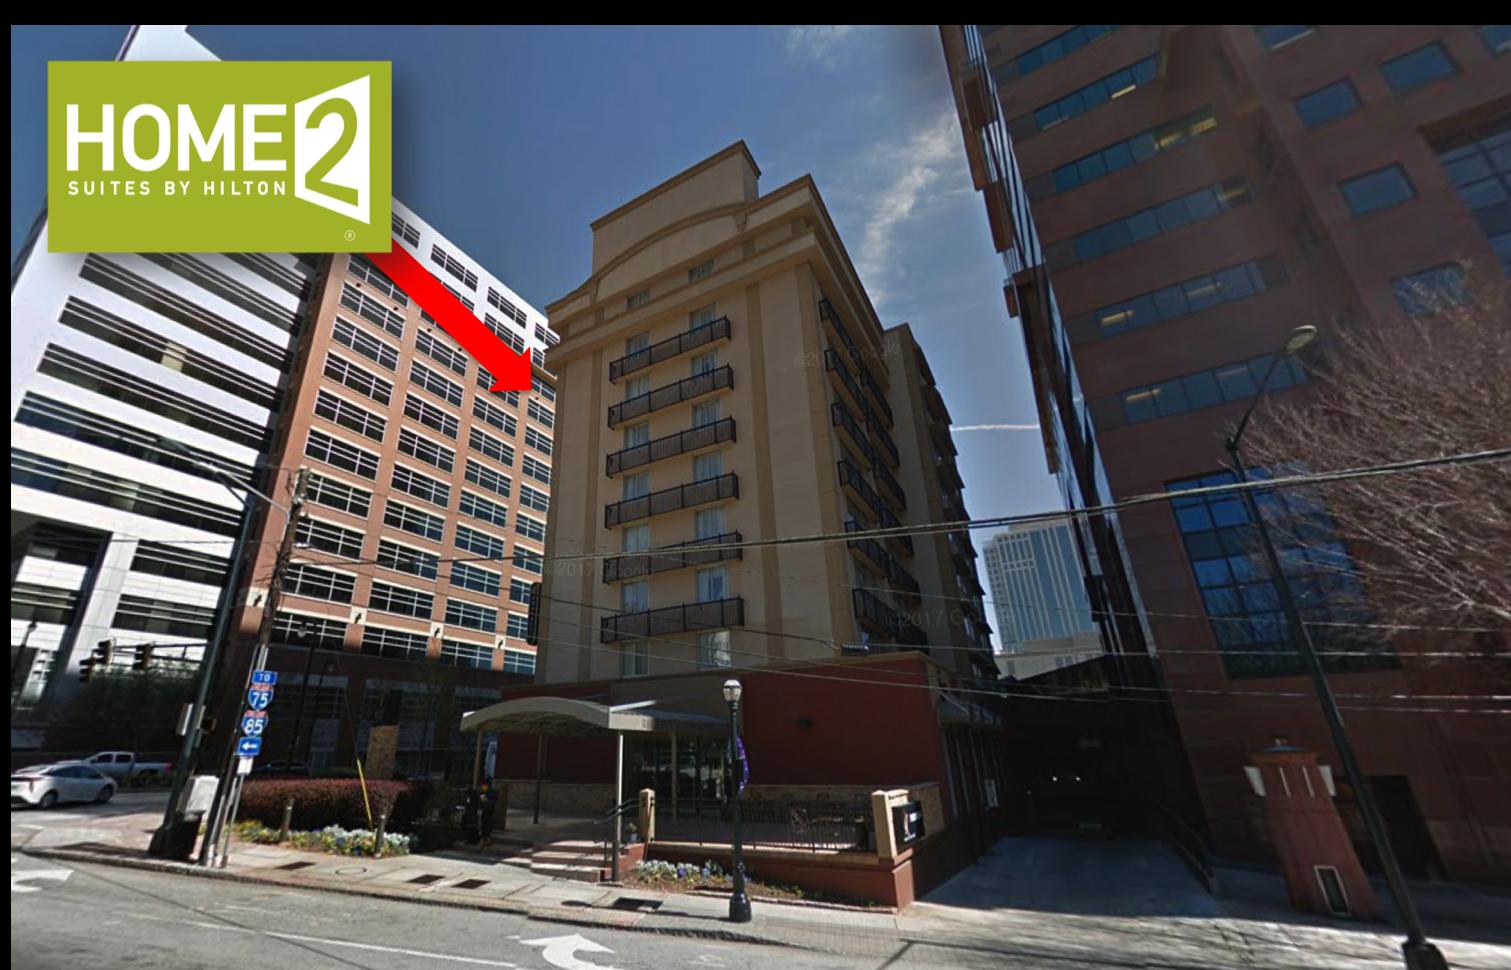 Home2 Suites Midtown Atlanta